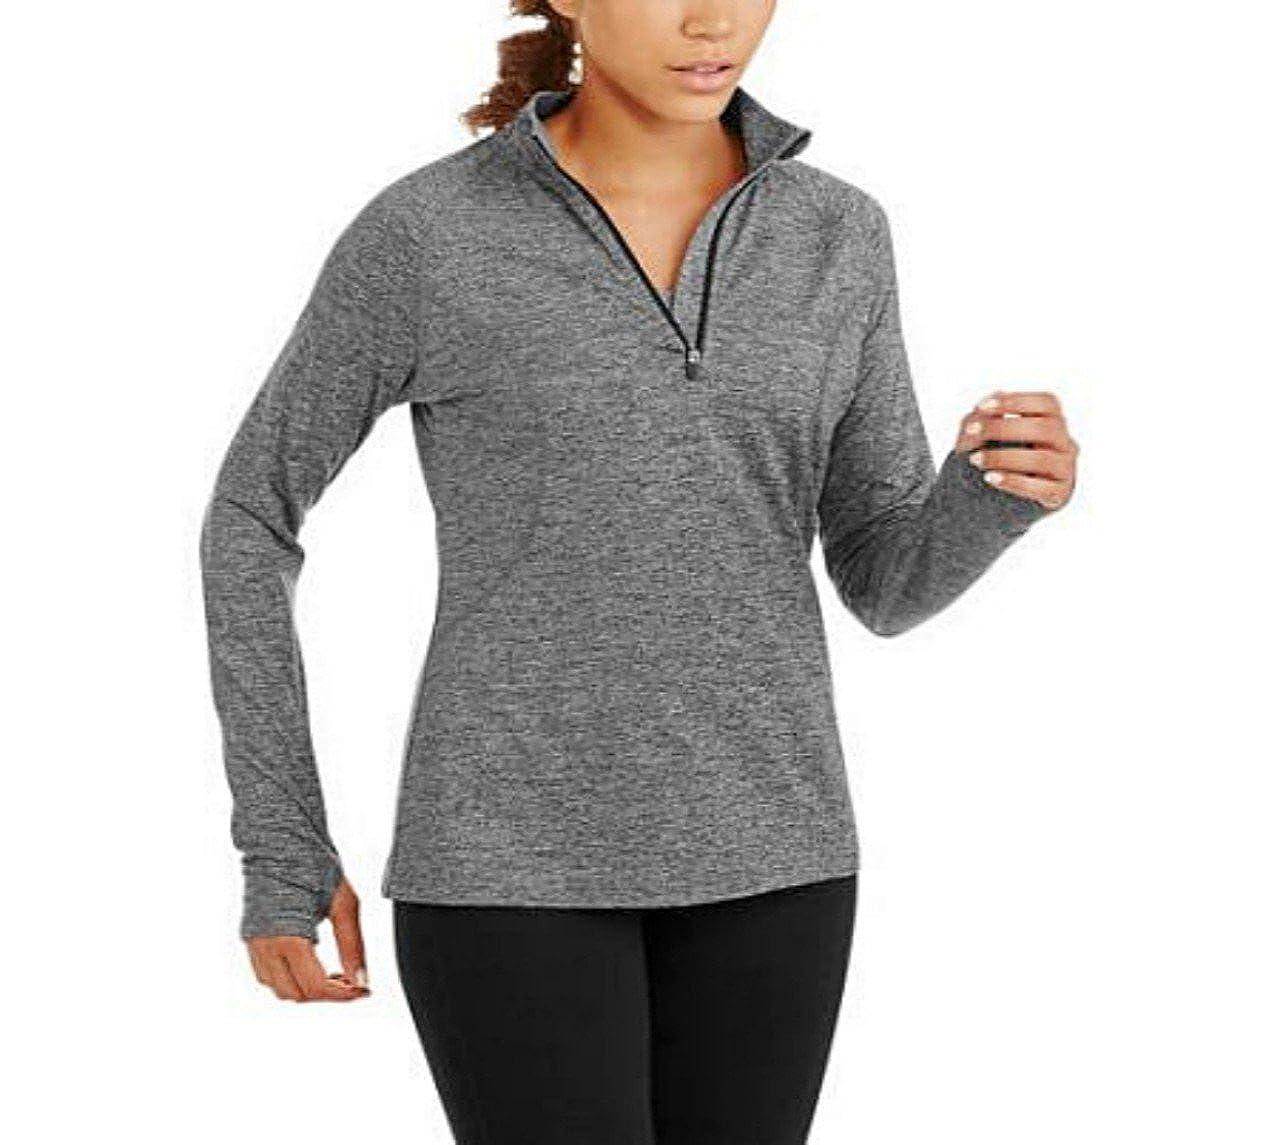 Danskin Now Women's Active Plus-size Mock Neck 1/4 Zip Athletic Running Jacket - Black Striated (1X)